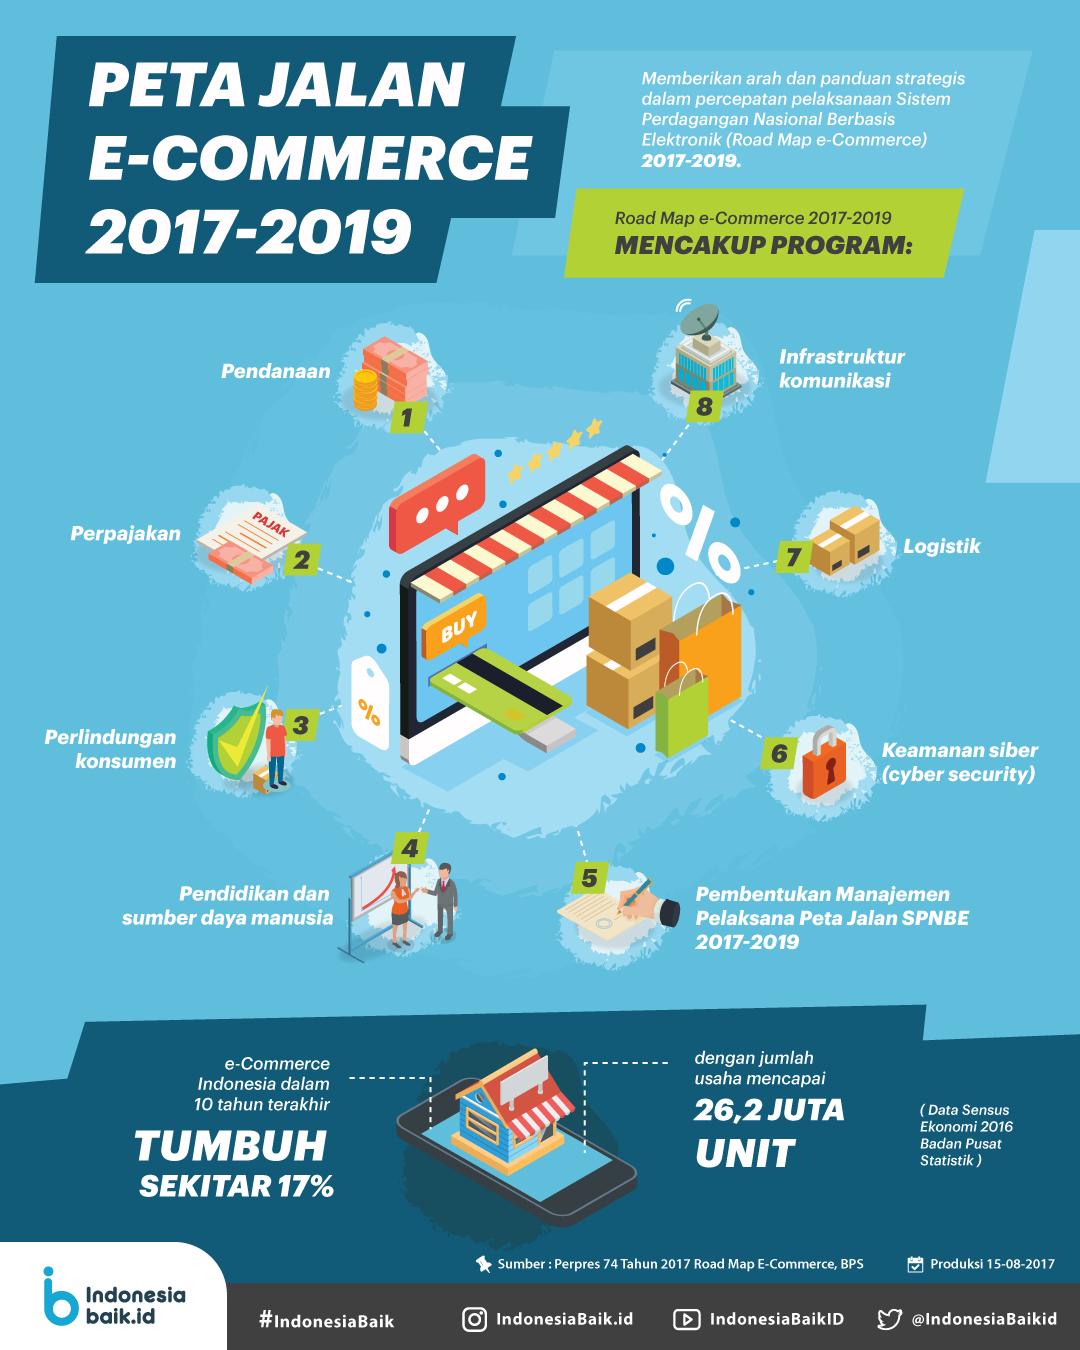 Peta Jalan E-Commerce 2017-2019